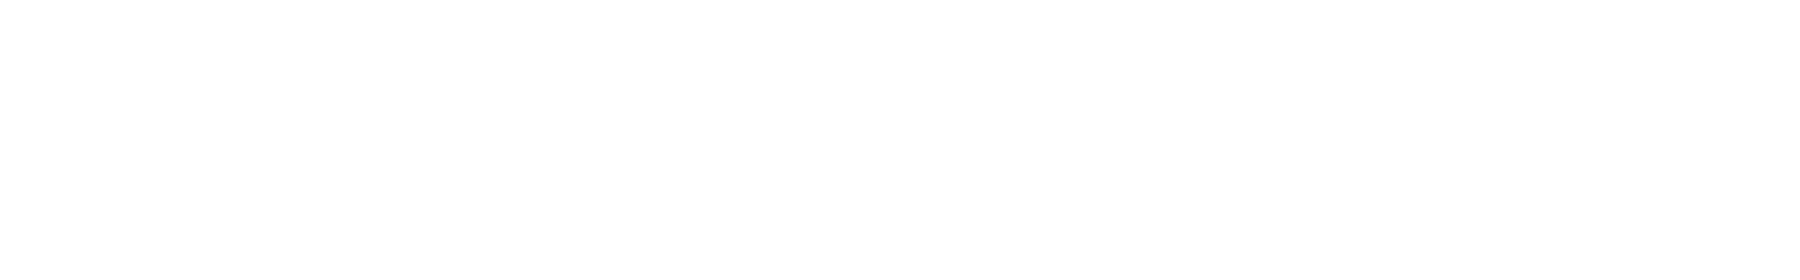 bigcymaticsbasshitfx